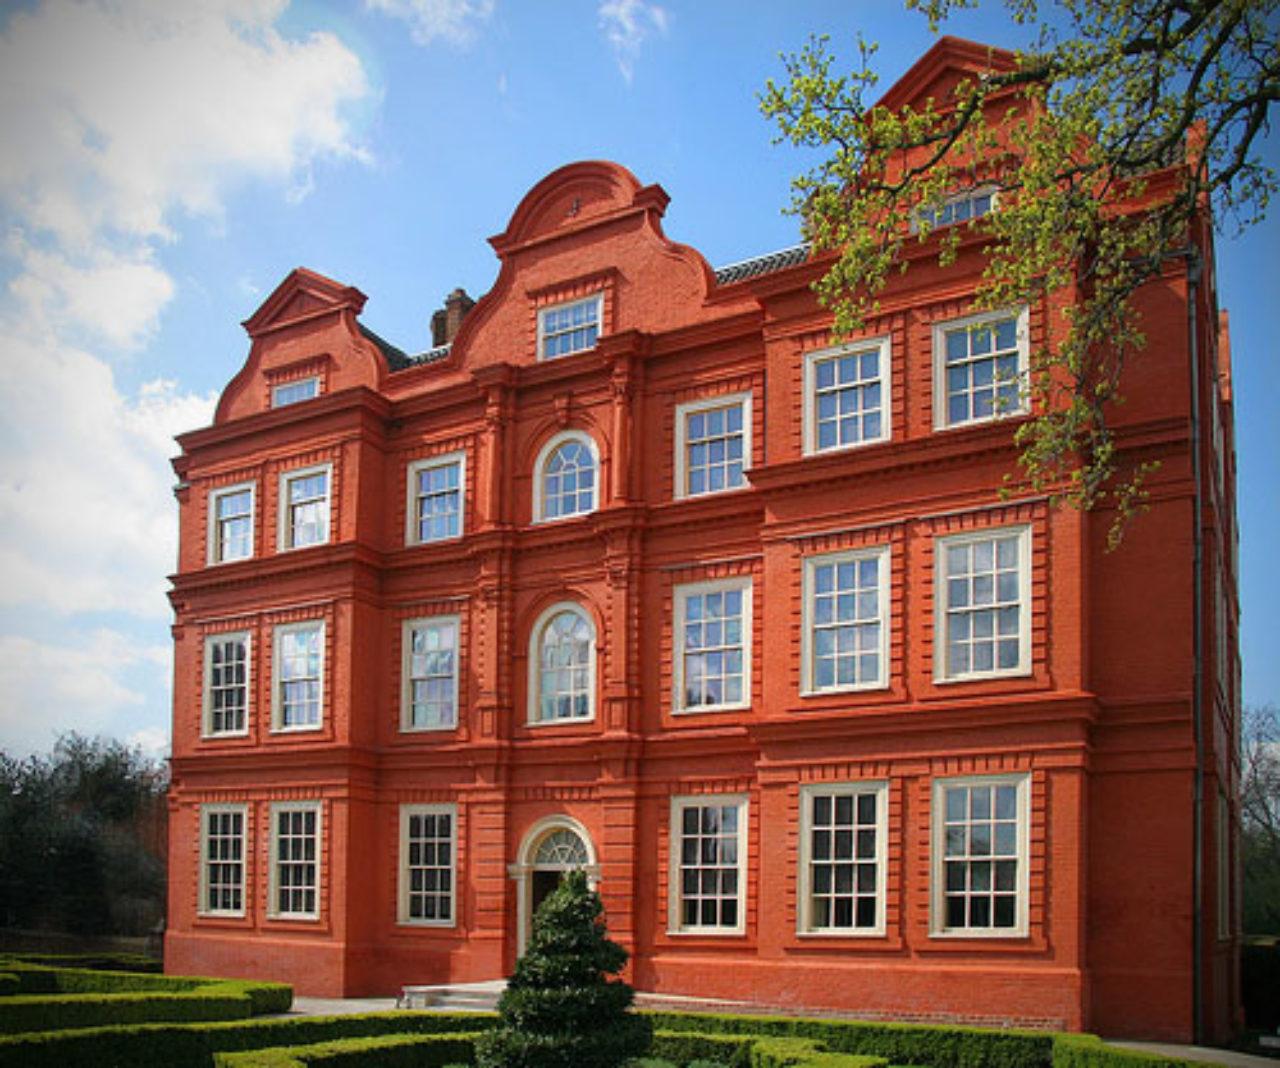 Figure 3: Dutch House, Kew Gardens, London (Robert Silverwood's Photostream)